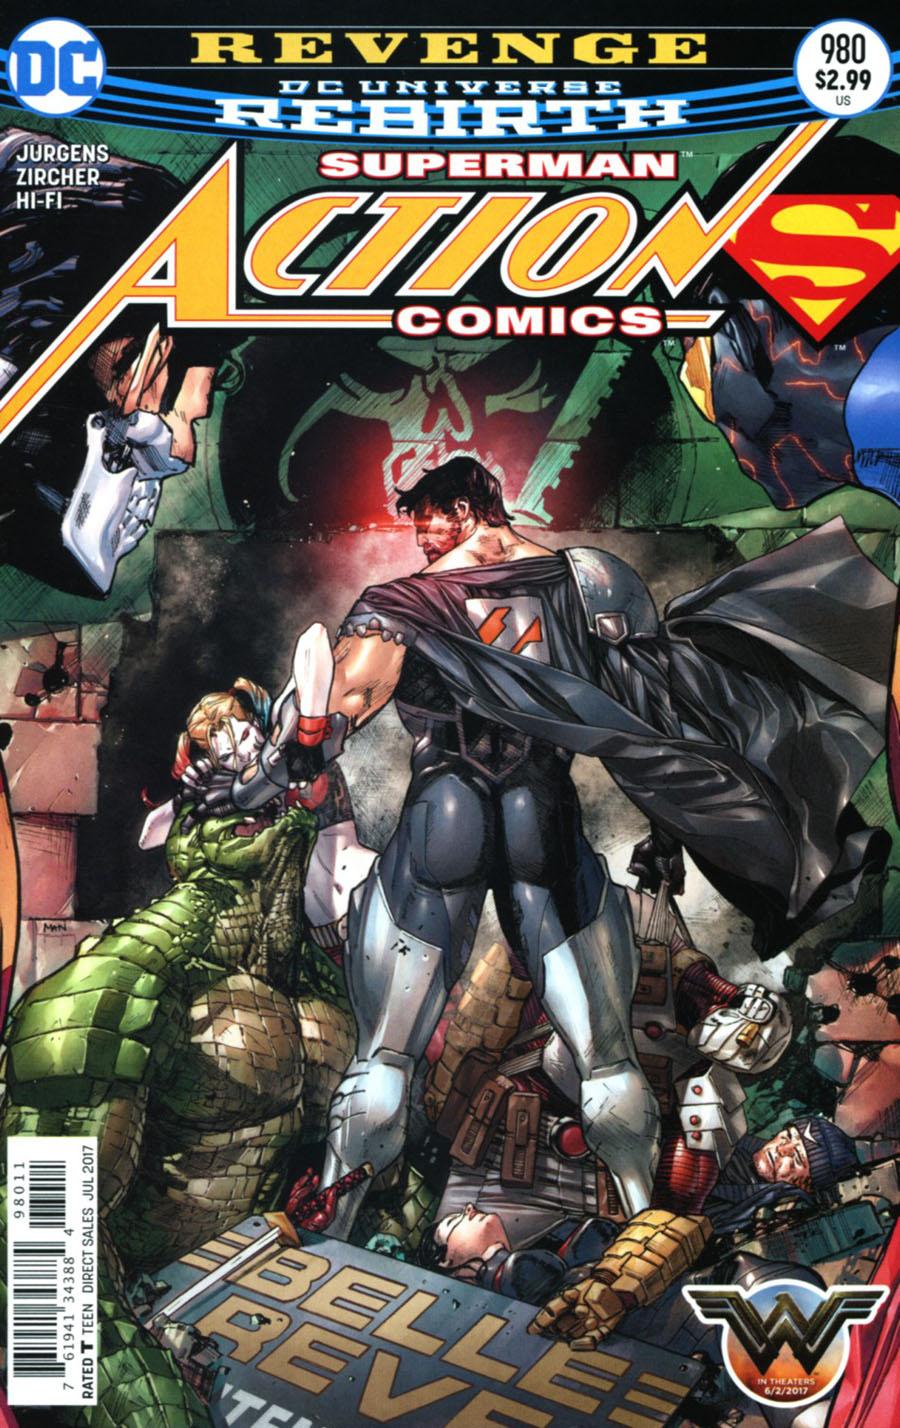 Action Comics Vol 2 #980 Cover A Regular Clay Mann Cover